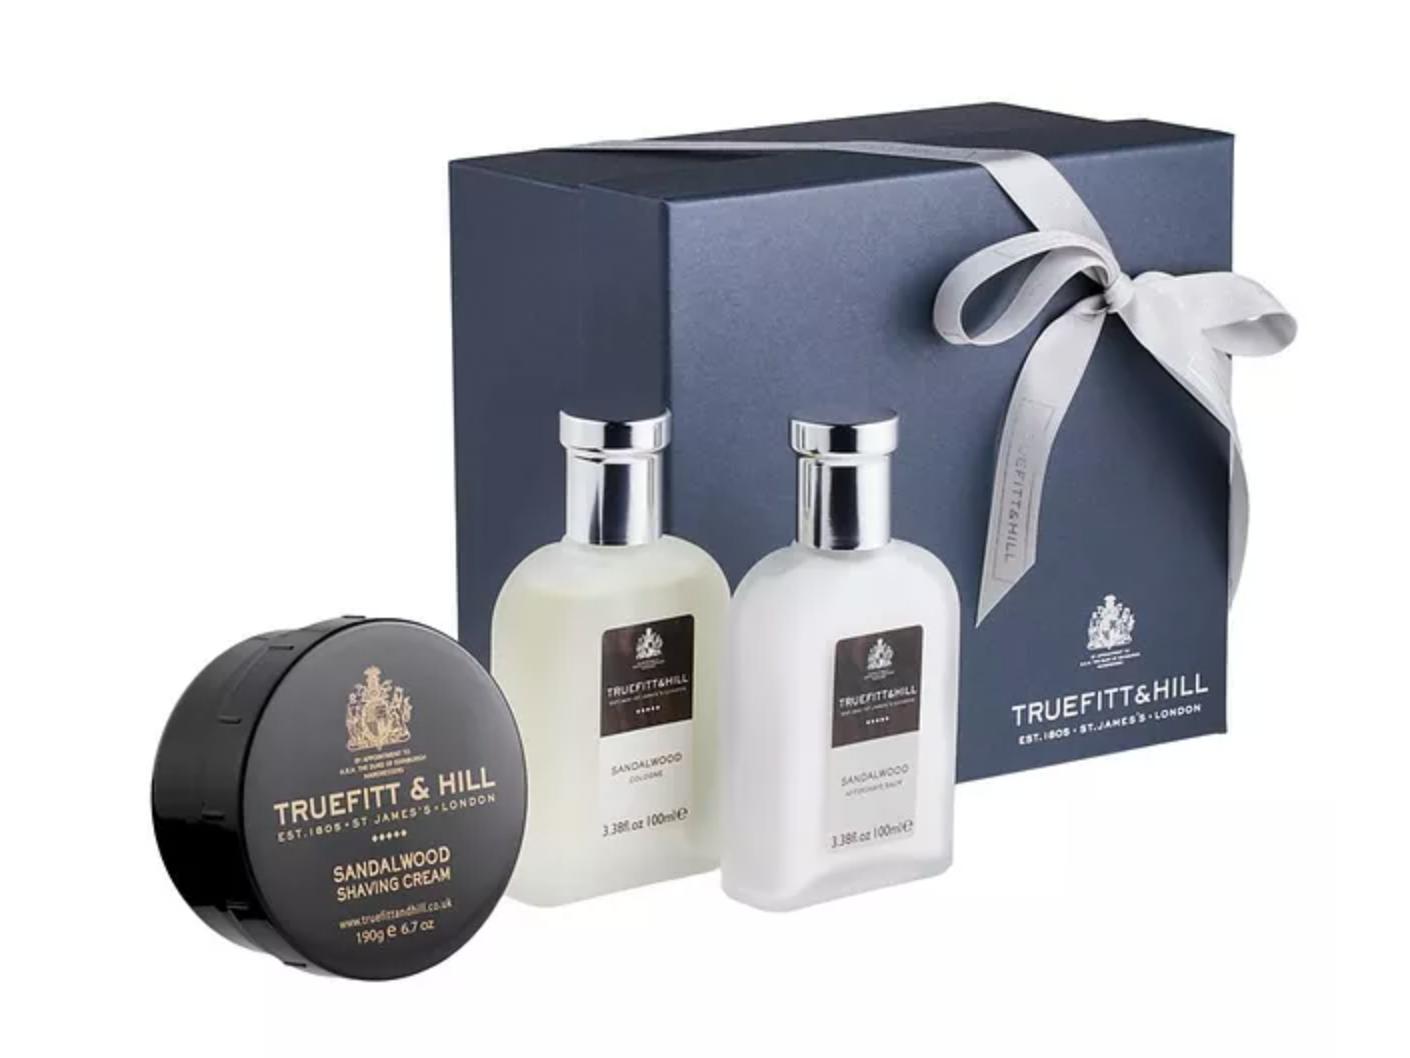 Harry Rosen Sandalwood Classic Shave Gift Set by Truefitt & Hill - $193.00 CAD